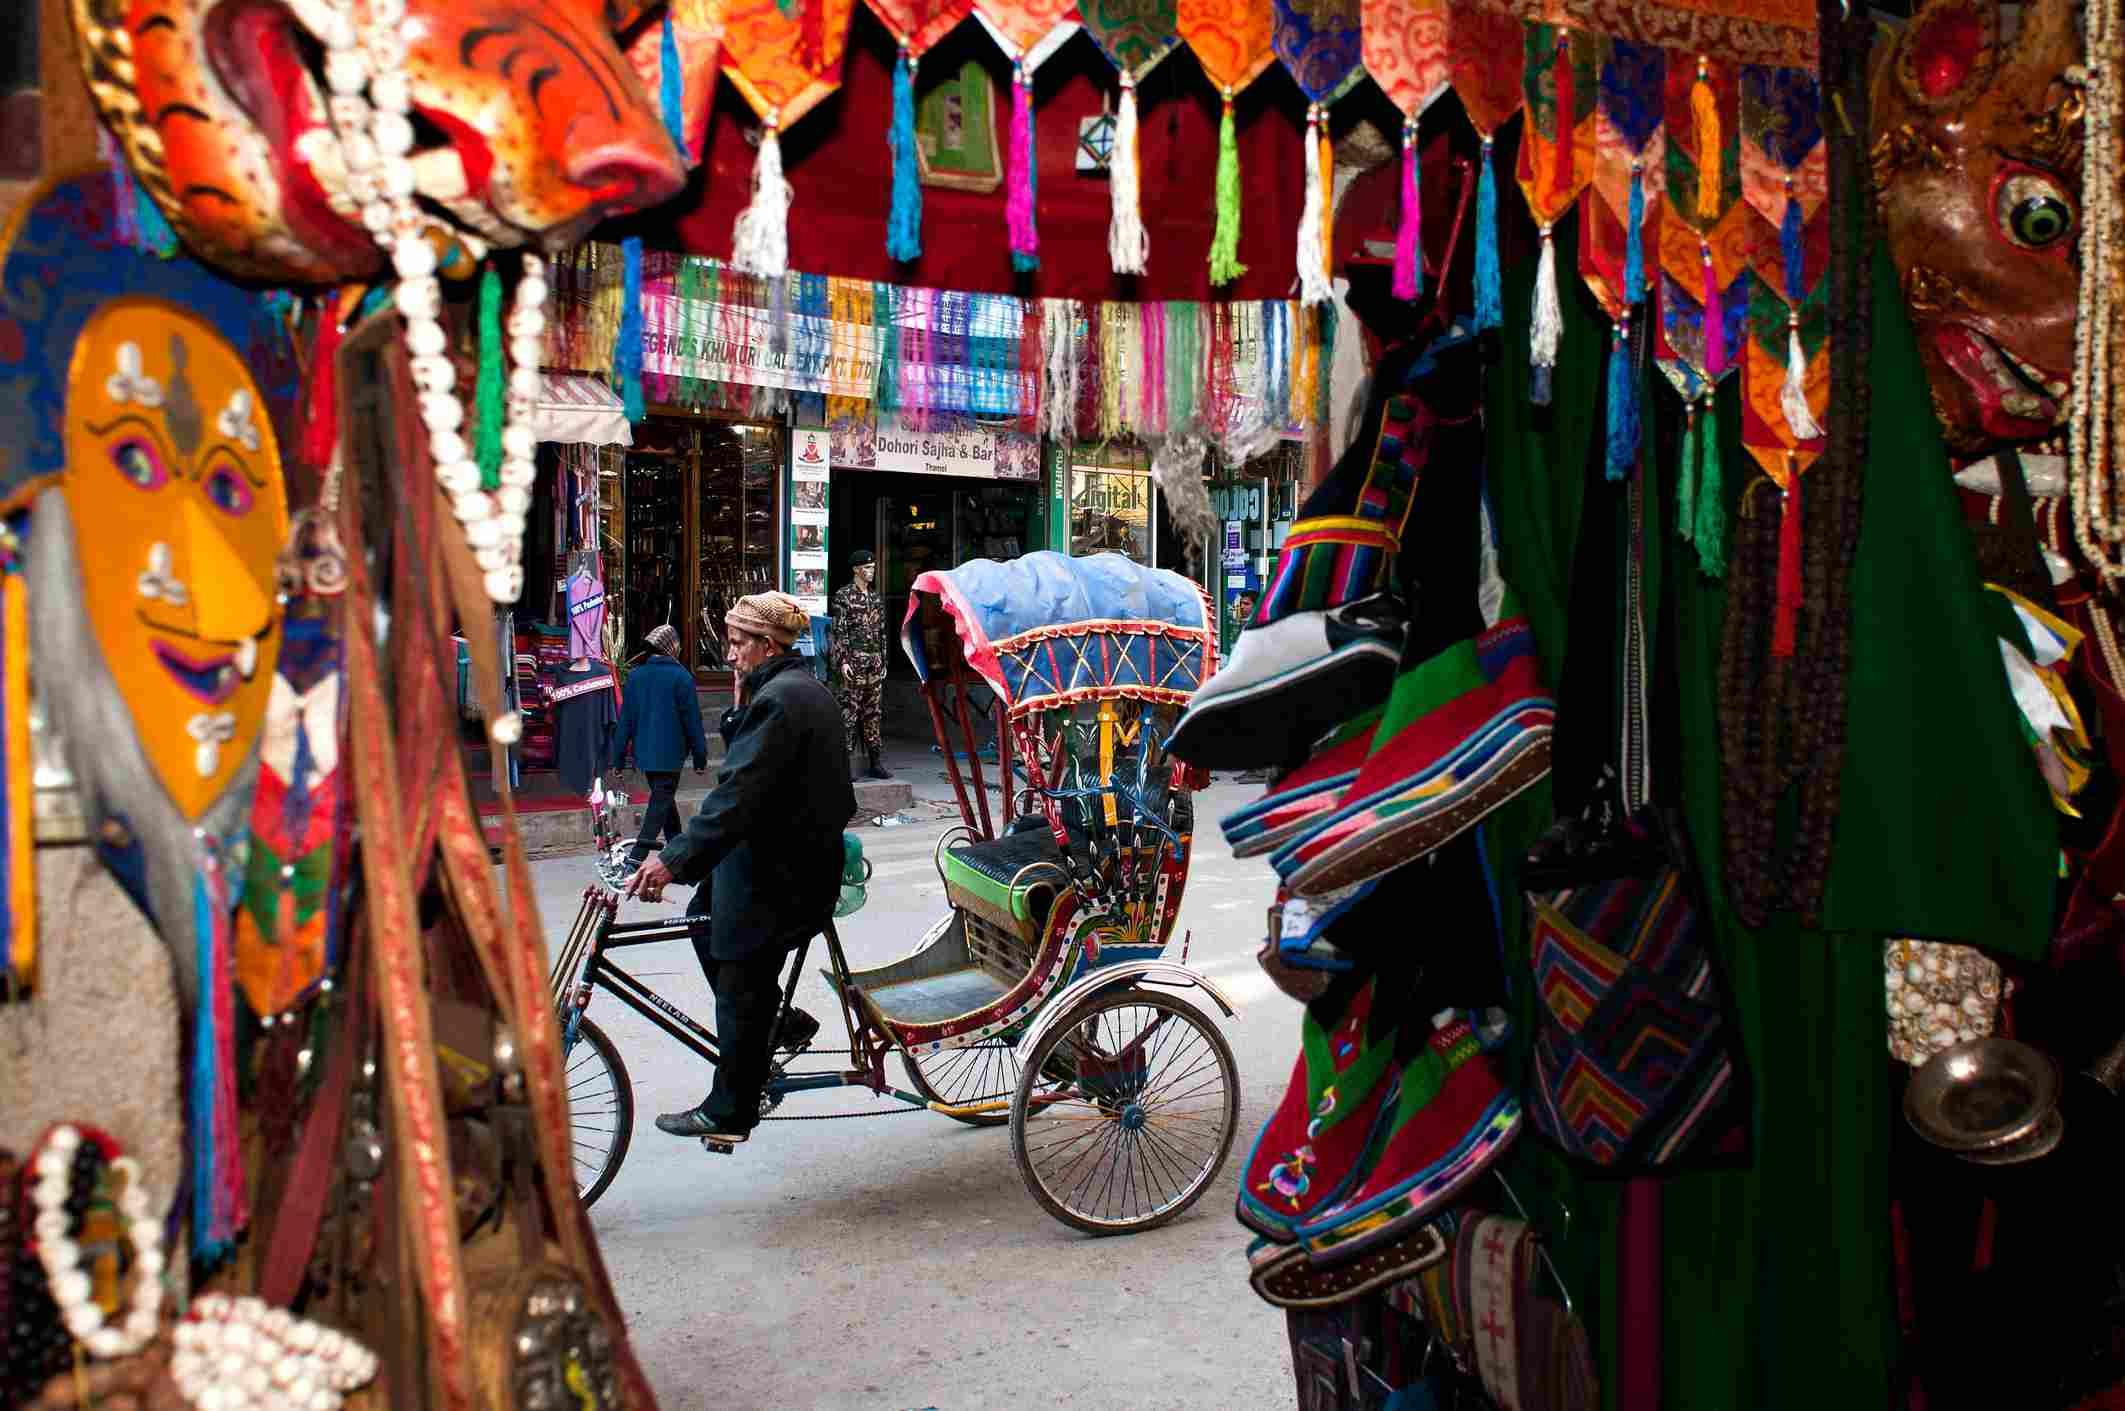 Rickshaw outside craft shop in Thamel, Kathmandu.